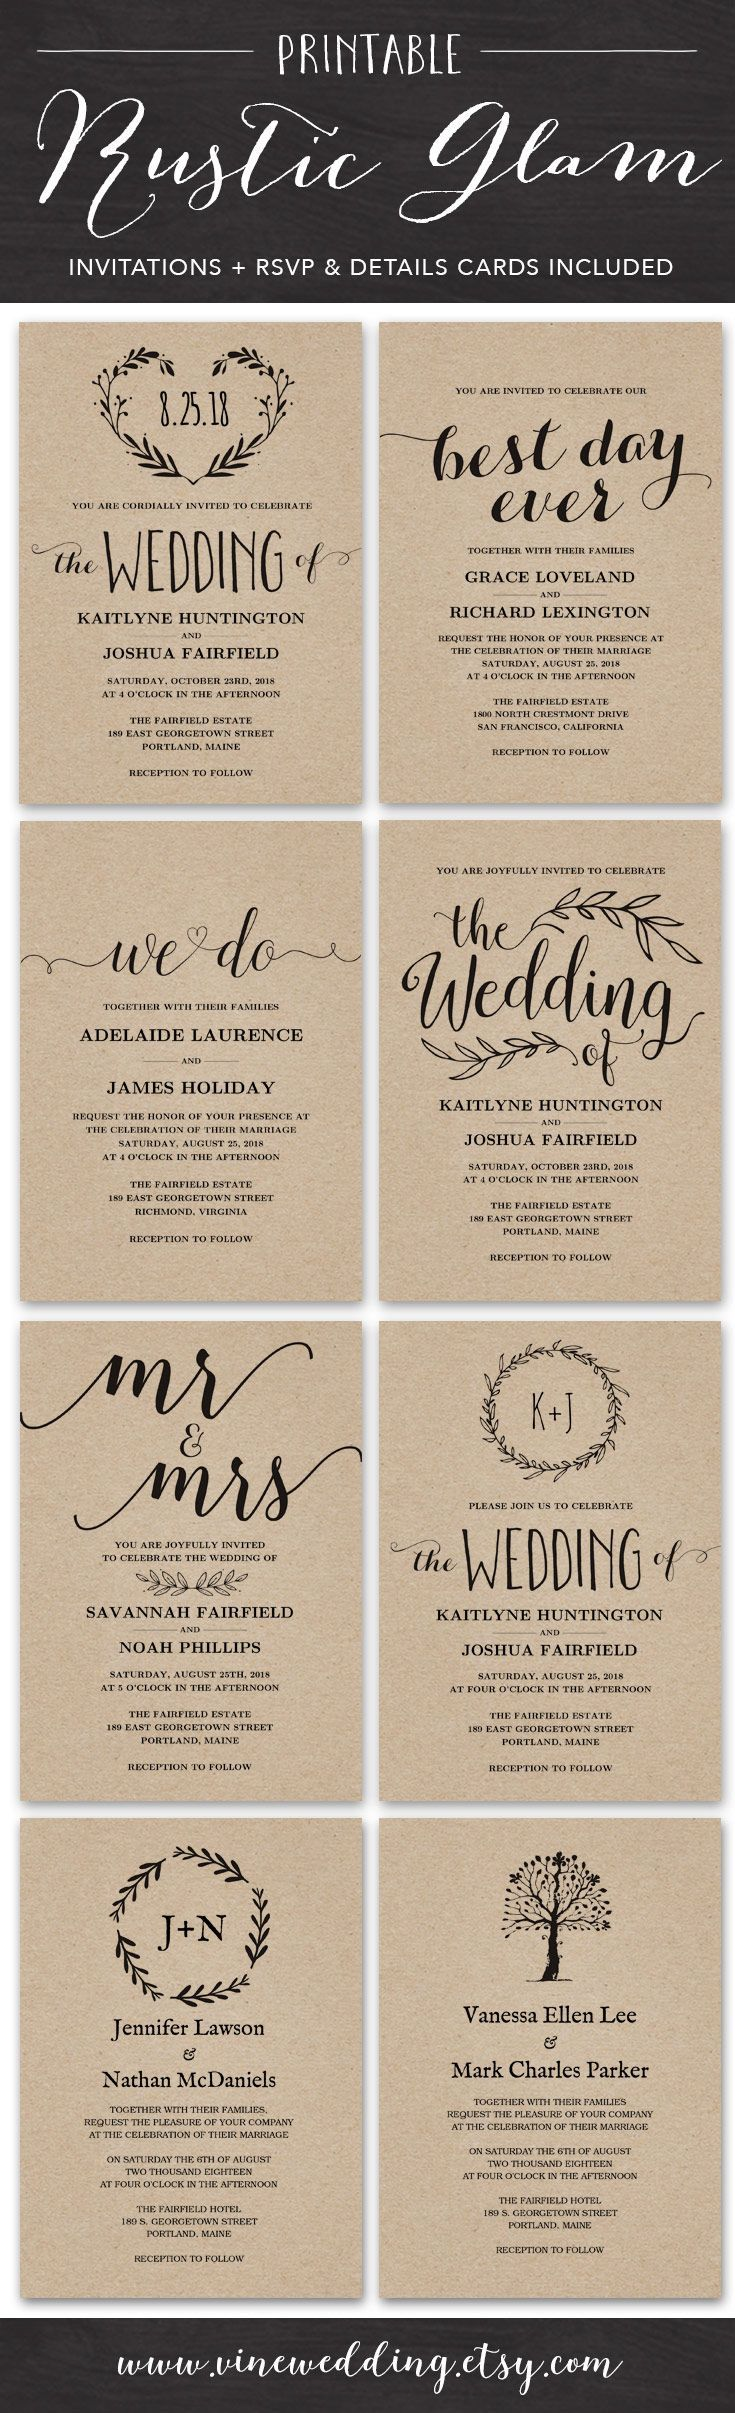 luau wedding invitation templates%0A Rustic Wedding Invitations  Printable DIY Wedding Invitation   wedding   invitations  rustic